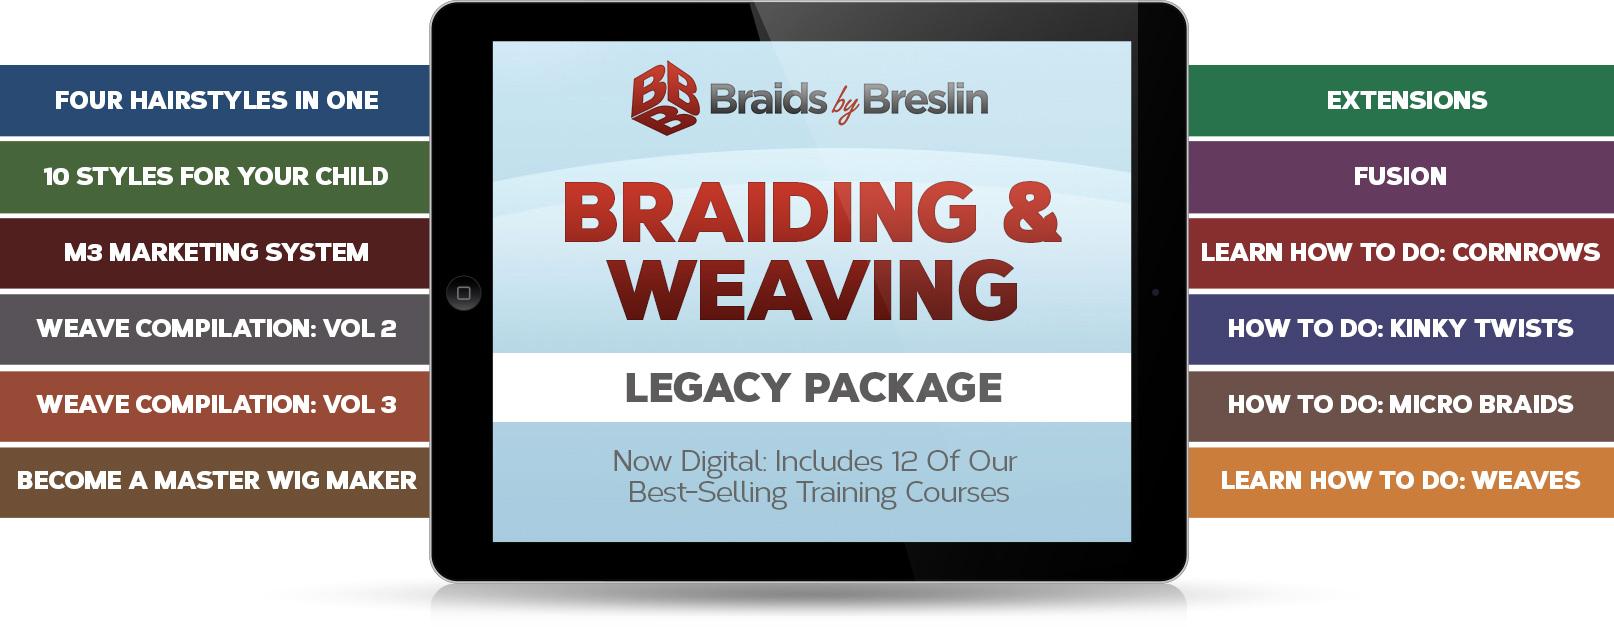 bbb-legacy-package